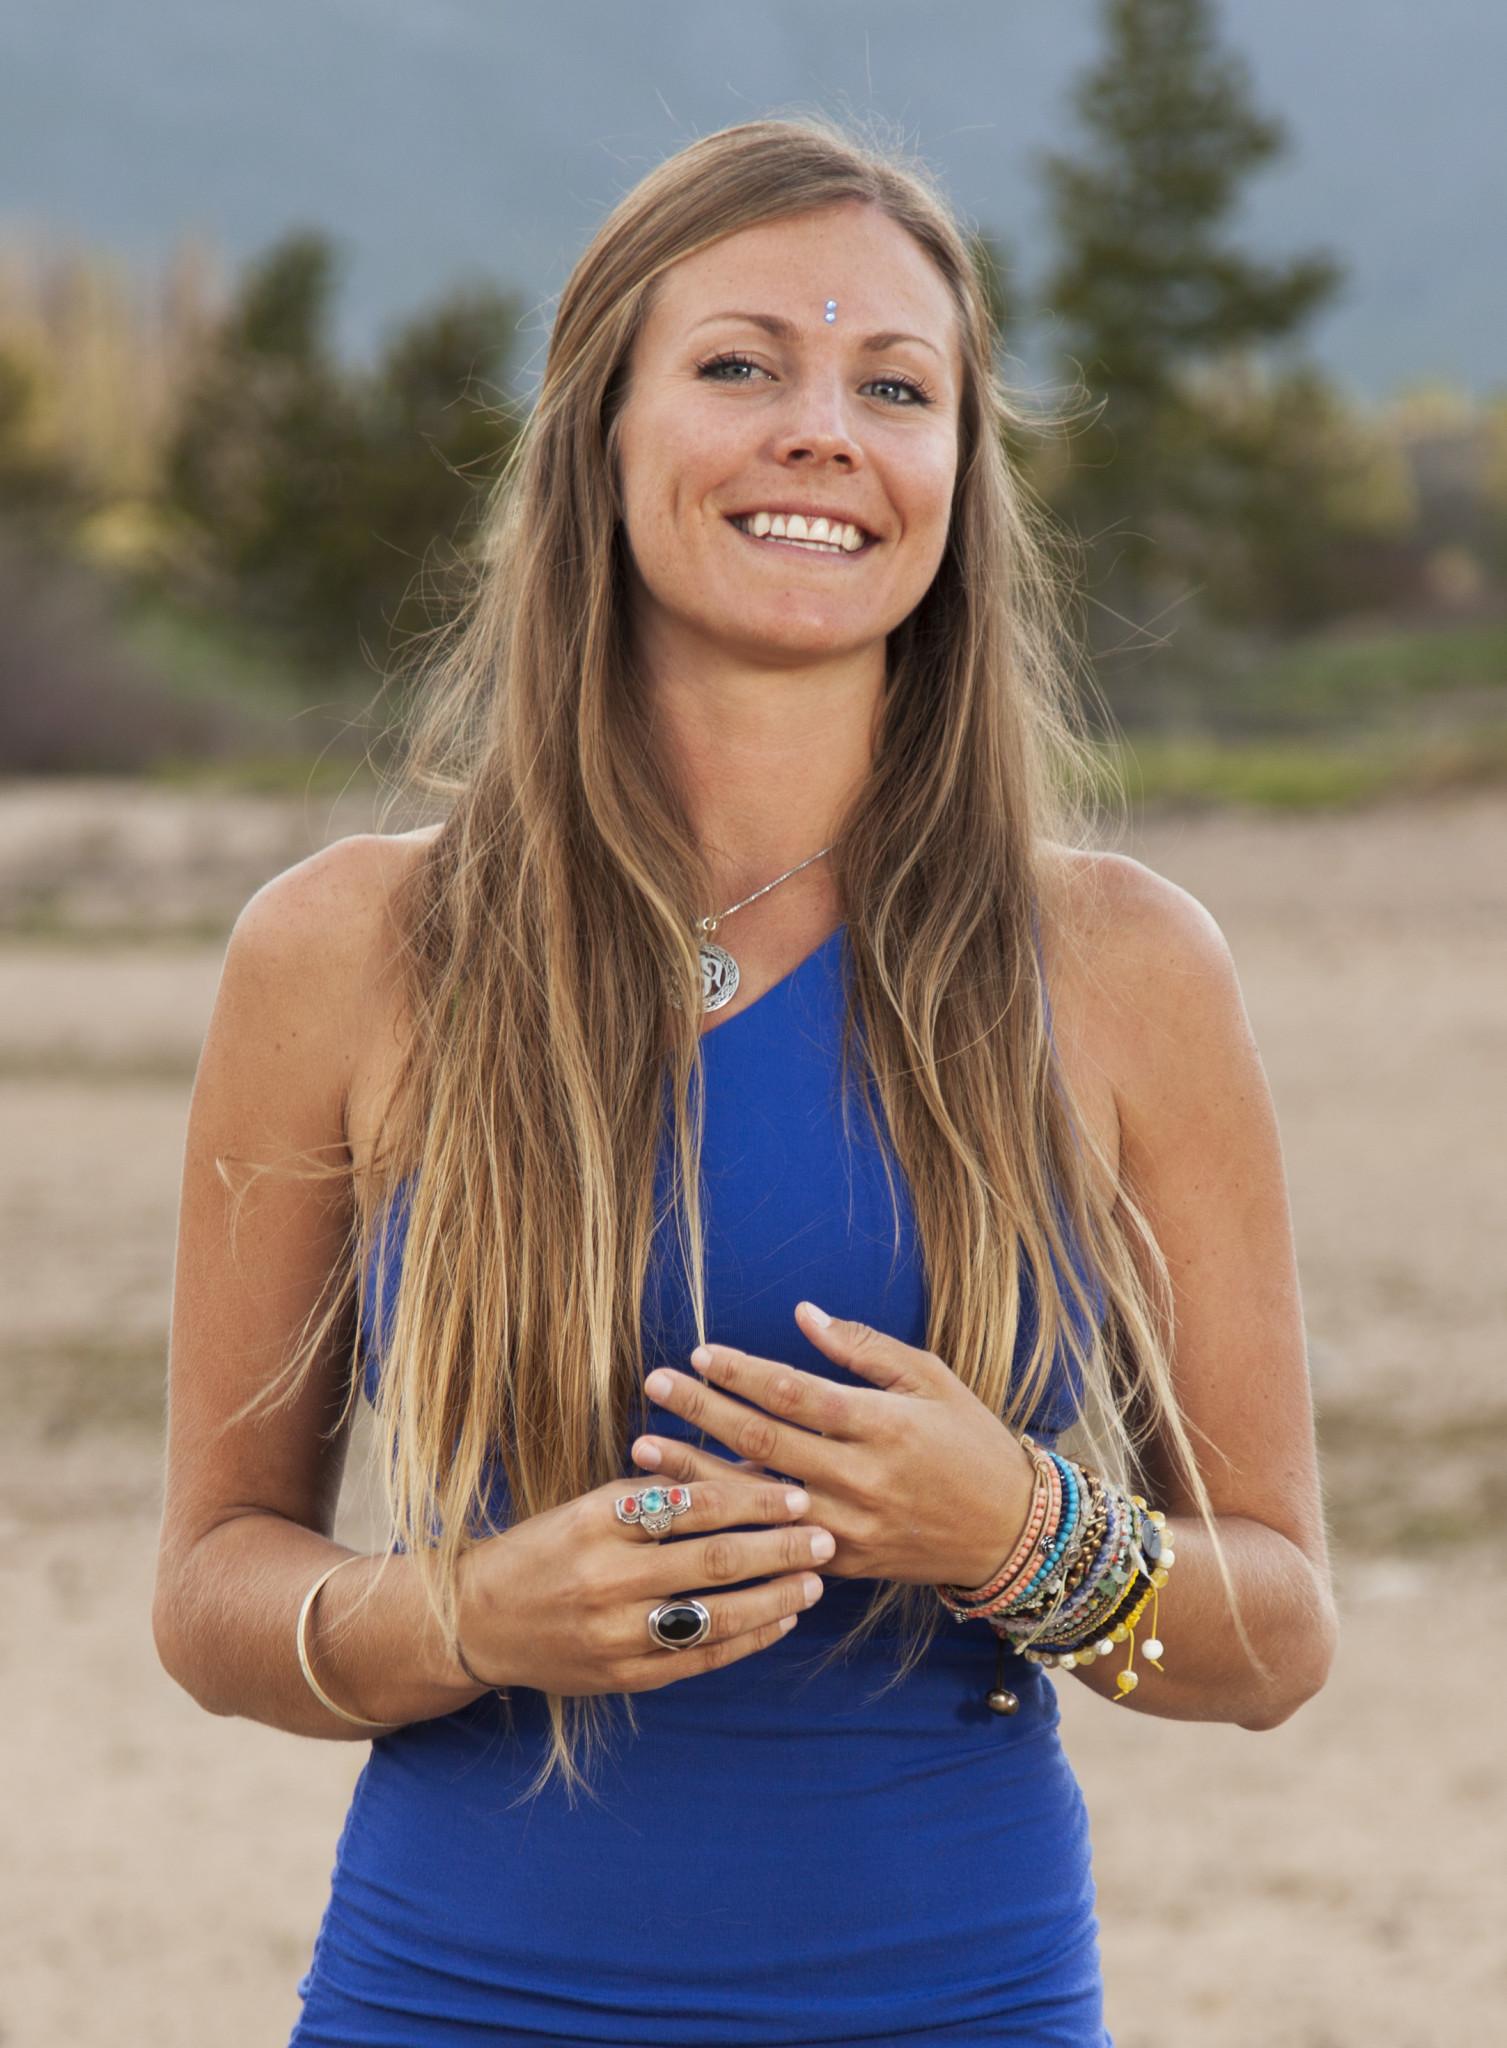 International Yoga Instructor Rachel Brathen